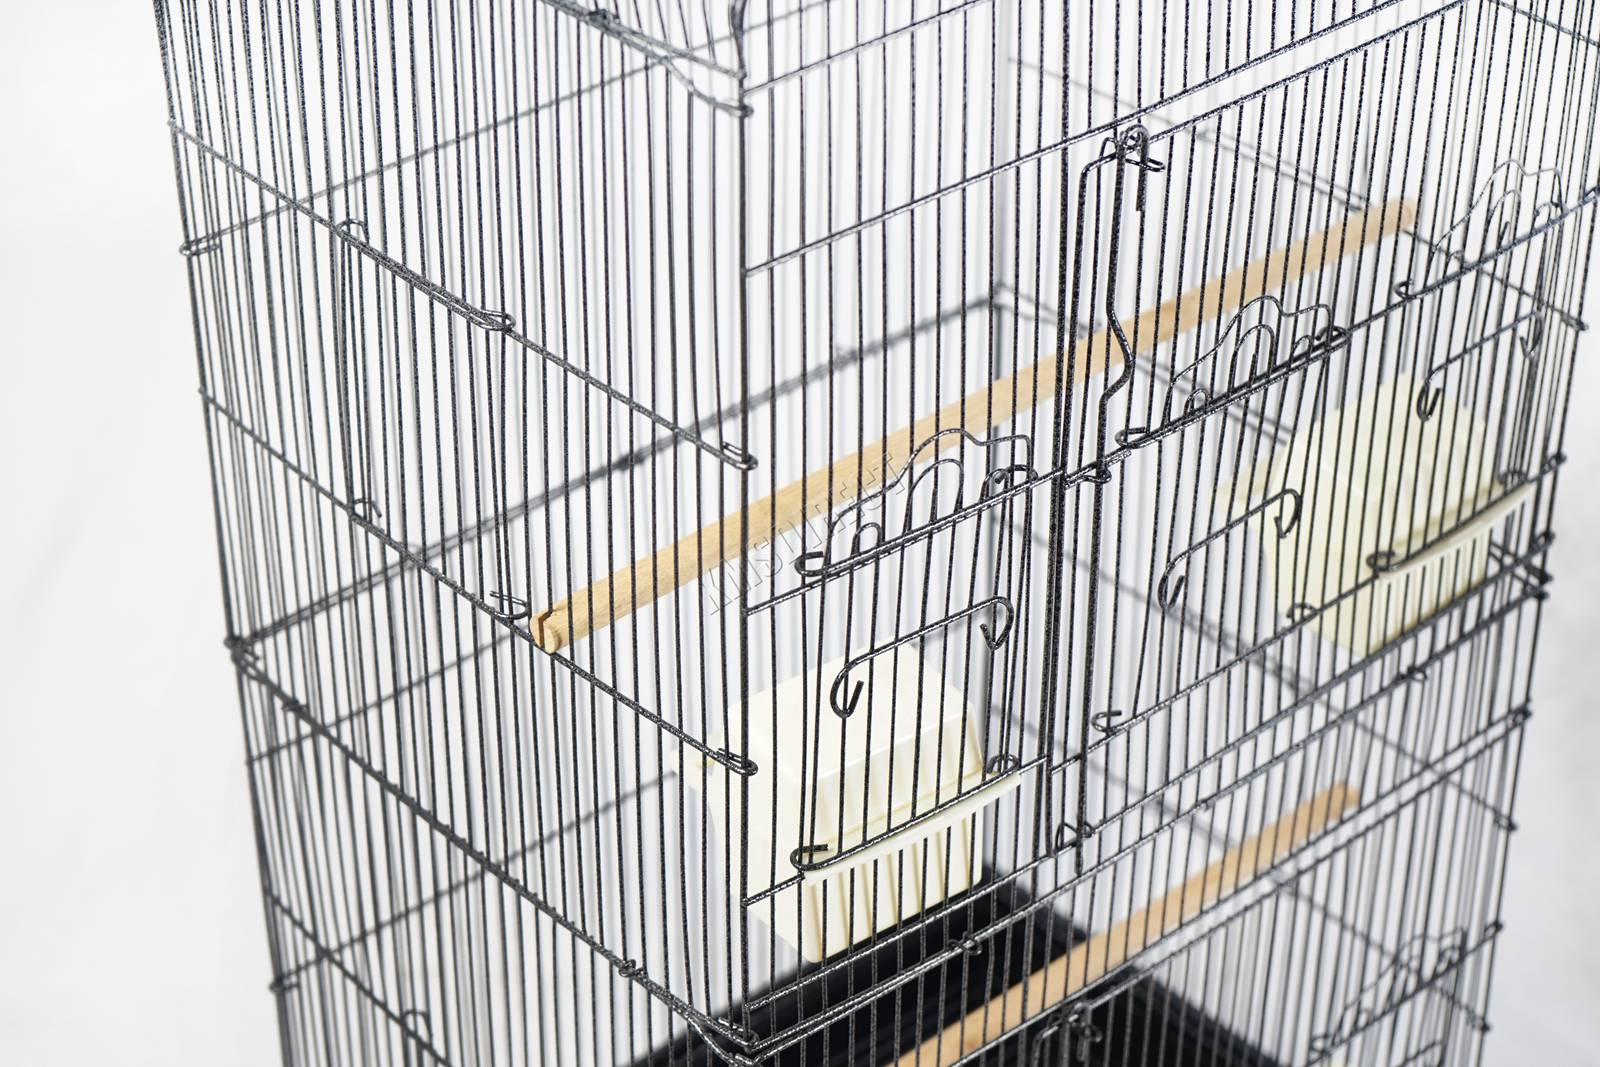 BIRD CAGE METAL MBC 05 HAMMERED SILVER KMSWM09 - Foxhunter Grande Metal Jaula con Soporte Pajarera Loro Periquito Canario Cacatua